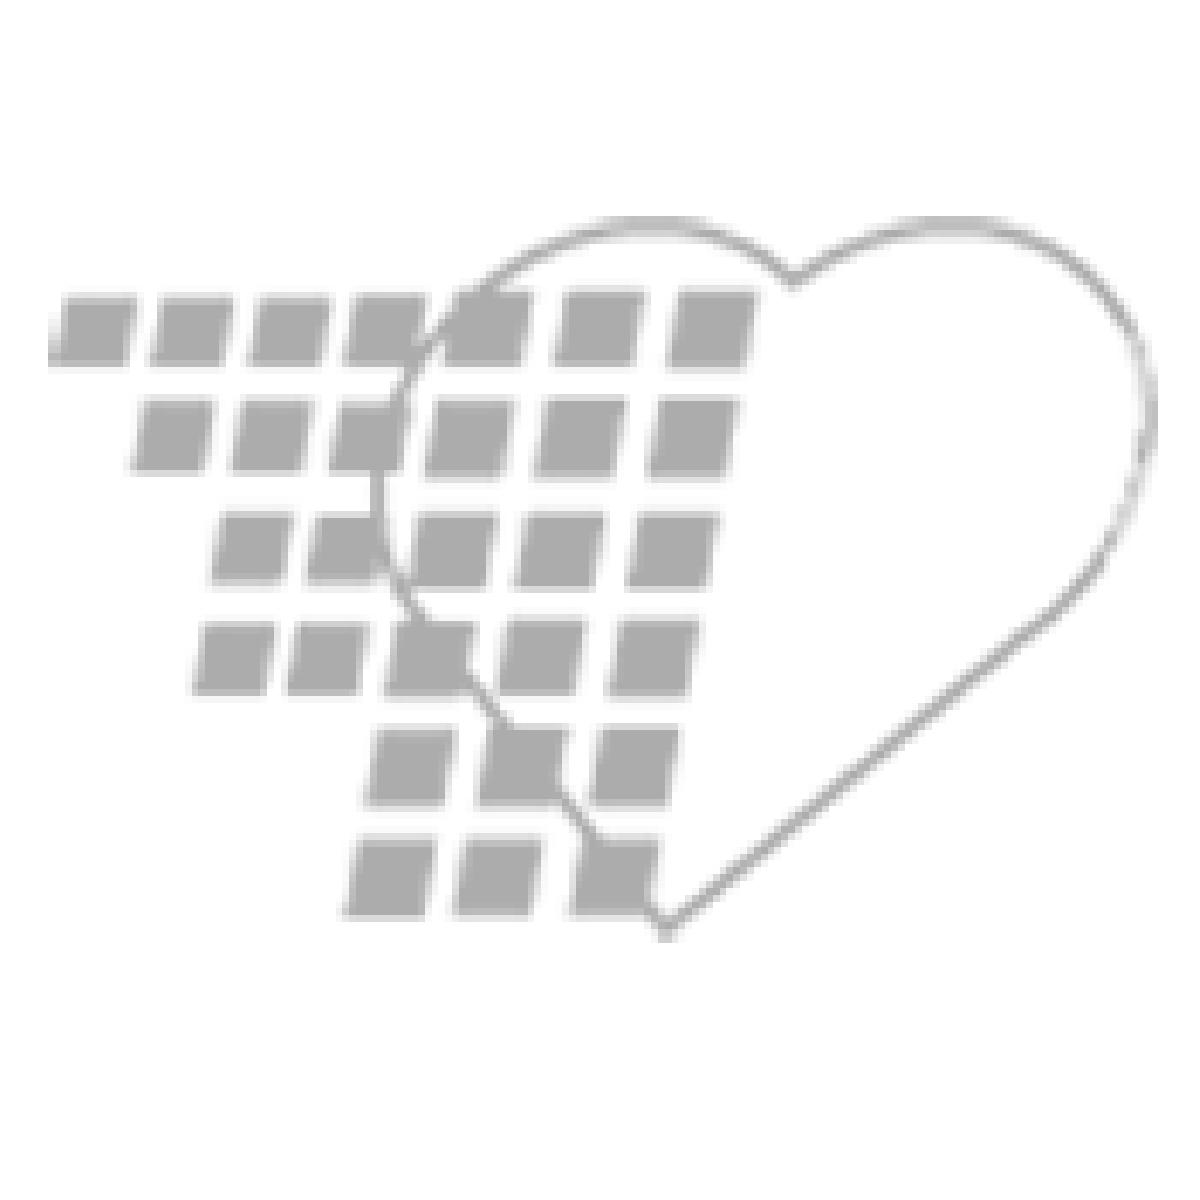 06-21-0645 - Wintrobe Hematocrit Tube 0-100